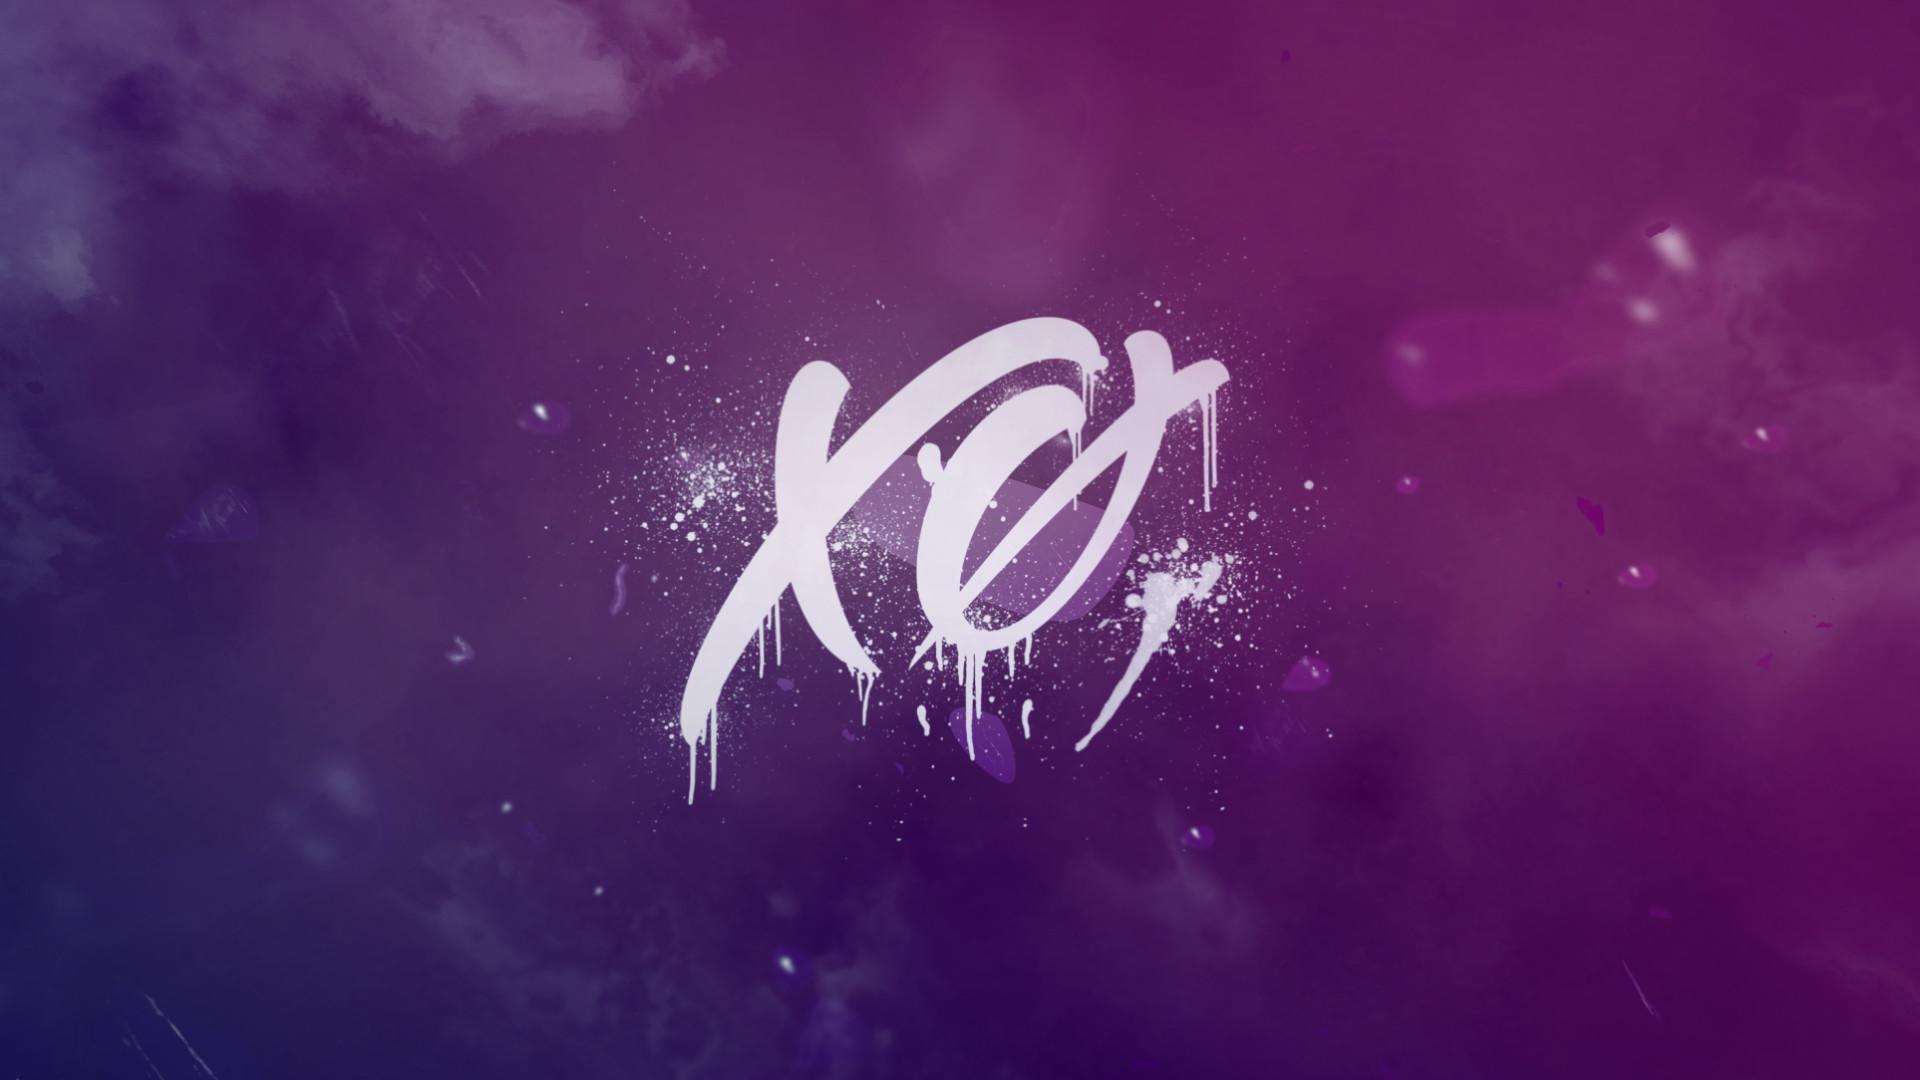 Beloved XO Picture designs